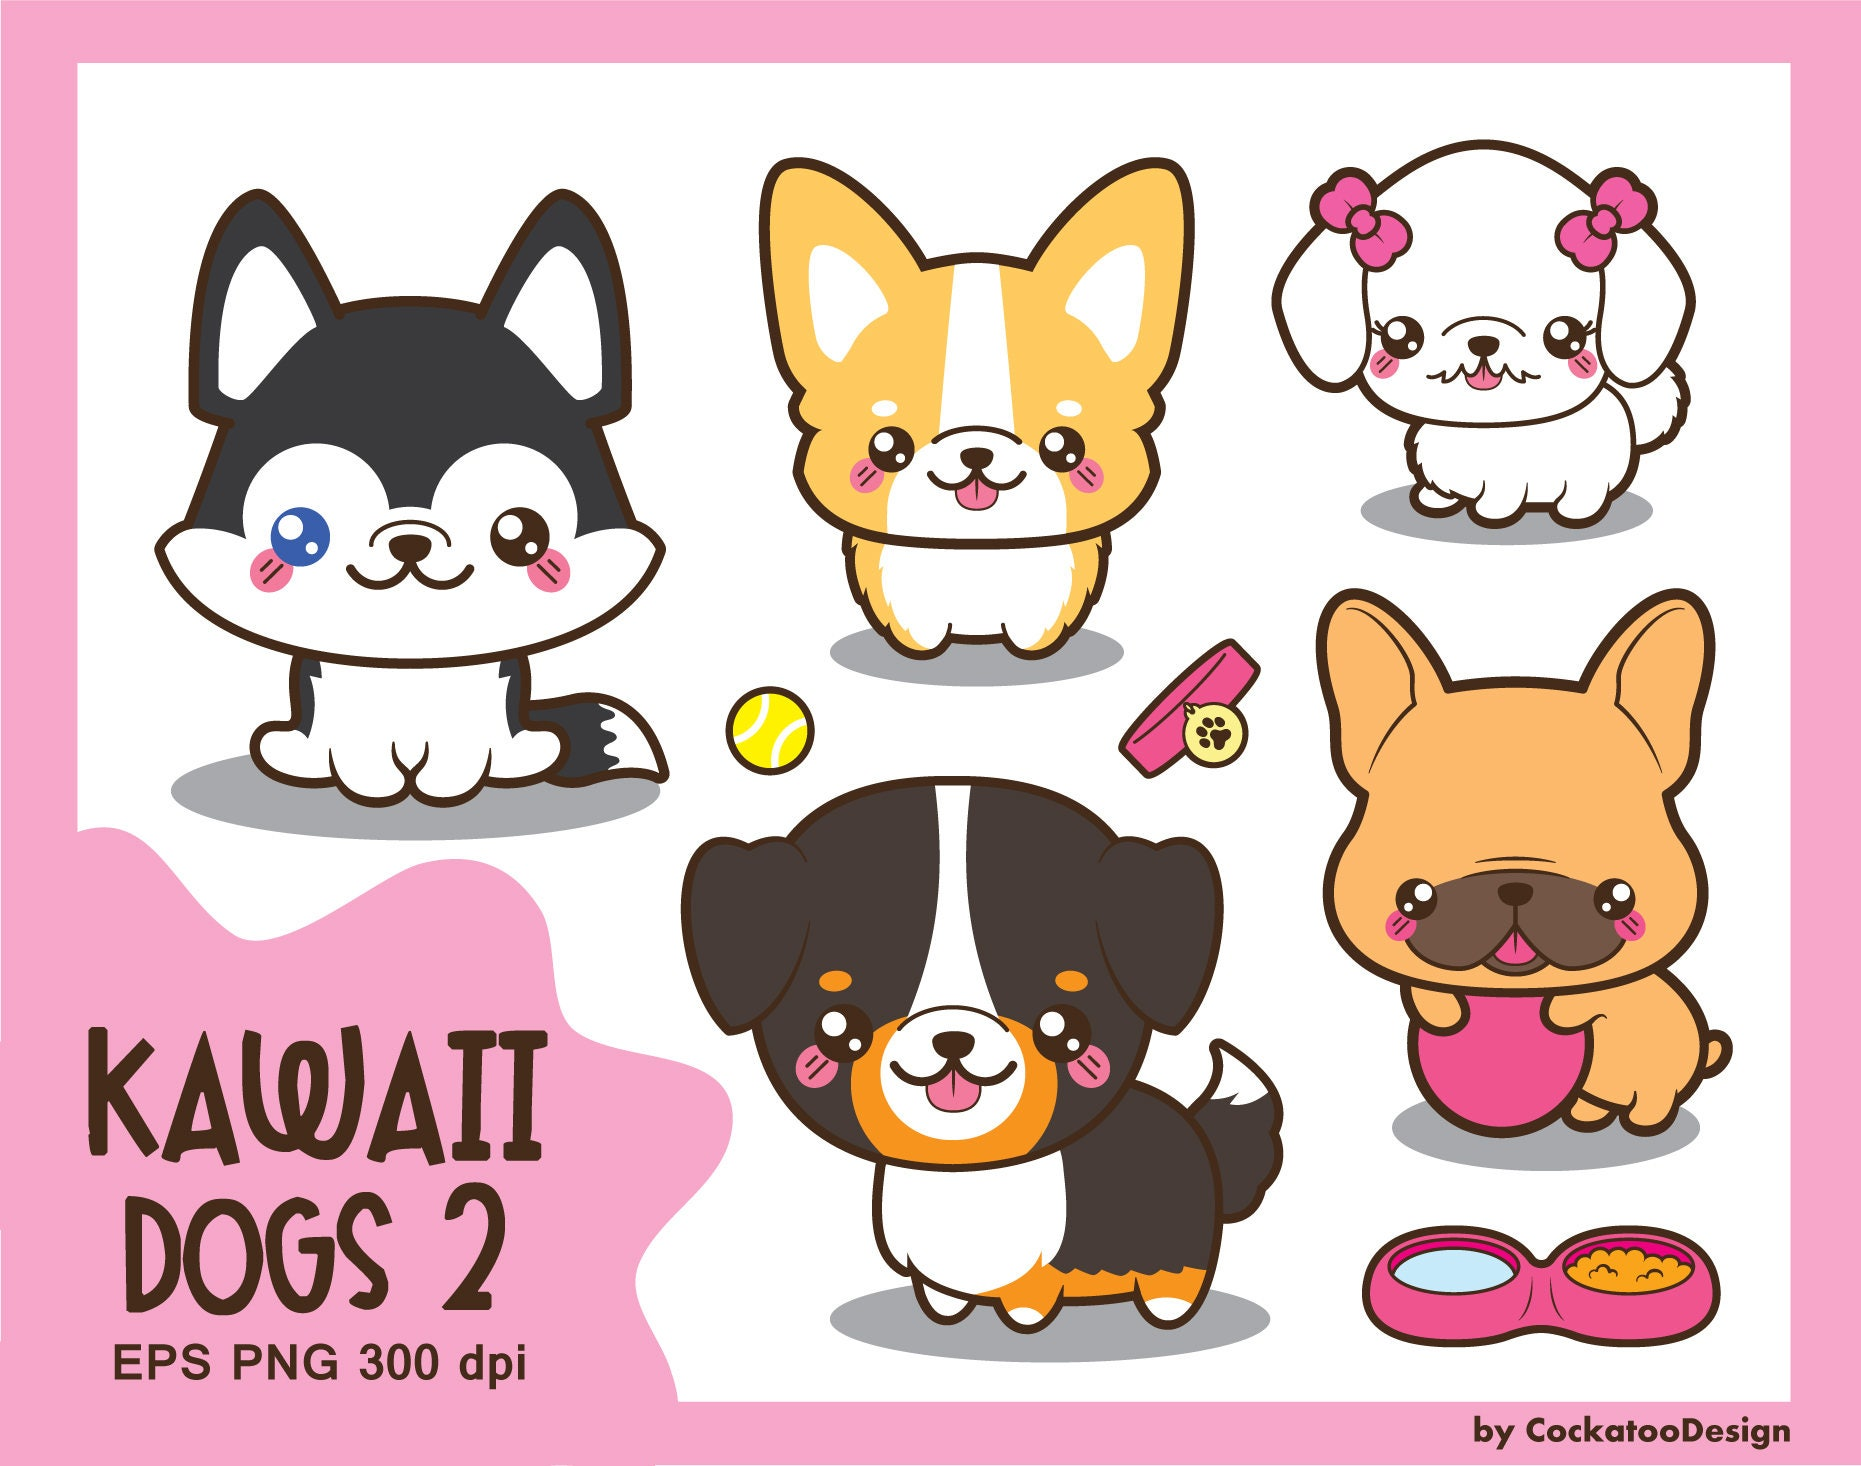 Kawaii dog clipart cute dog clipart dog breeds clipart | Etsy